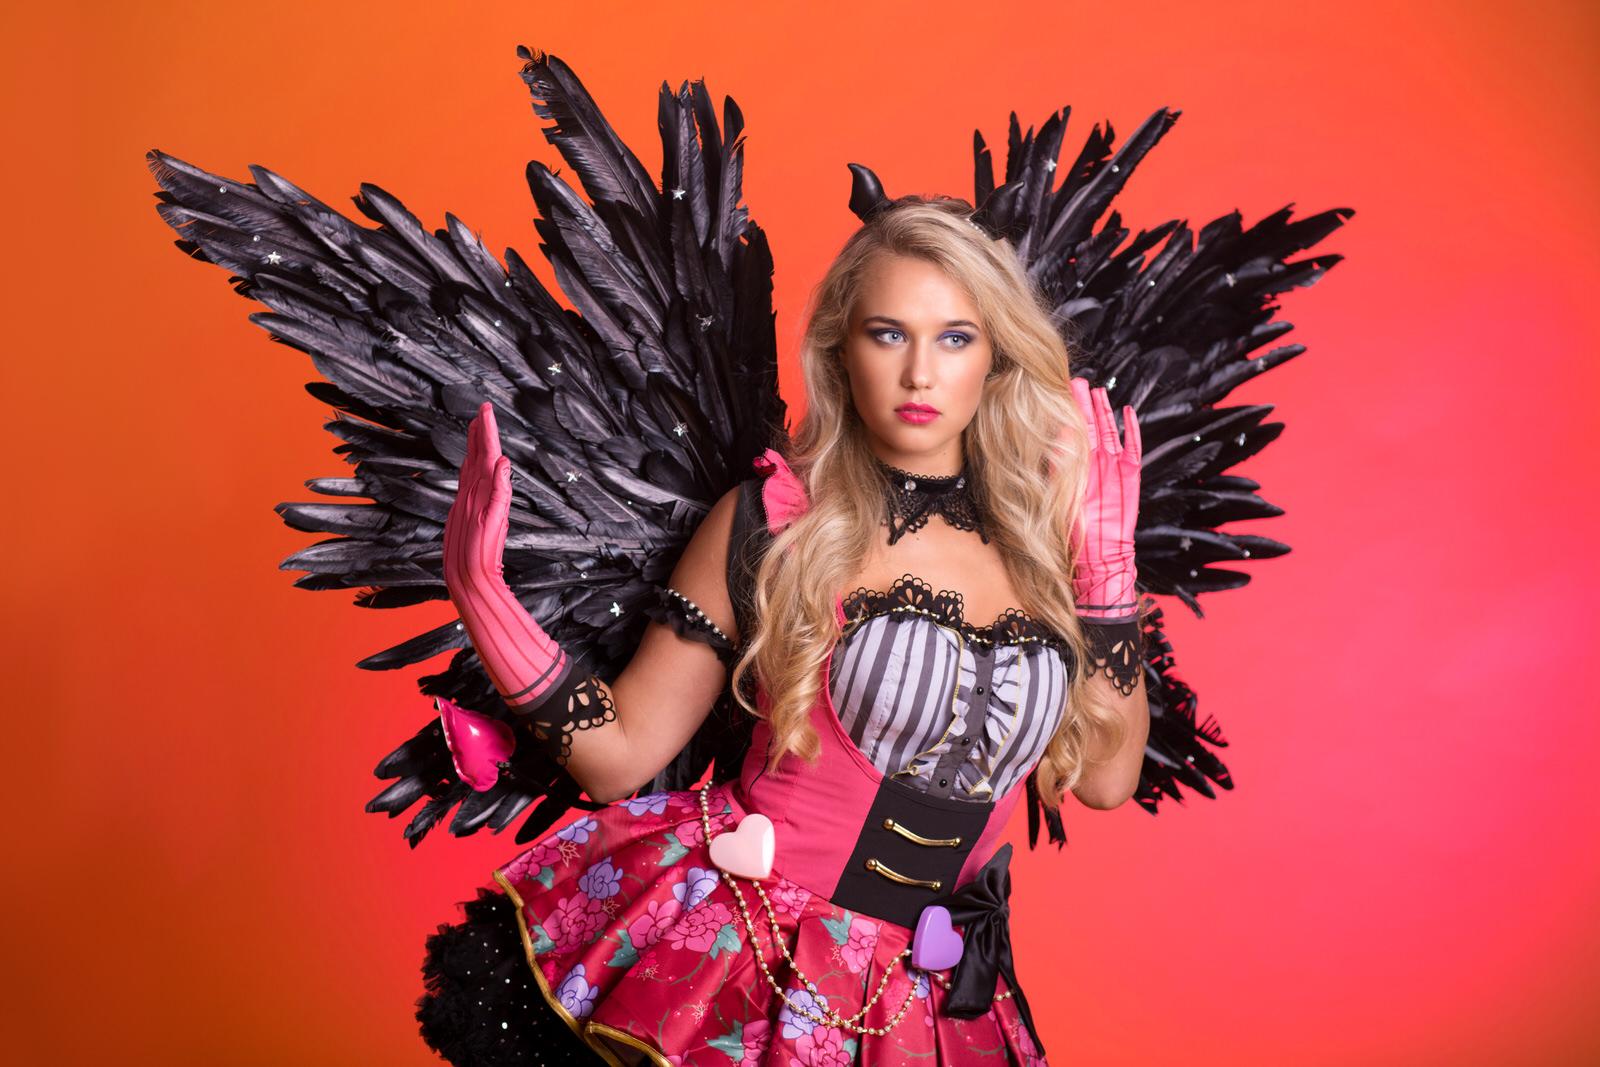 Halloween, Halloween Dame, Duivelse Evenementen, Spooky Girl, Promotion Dancer, Halloween Danseres, Freestyle dancer, Halloween Angel, Sweet Devil, Little Halloween Devil.